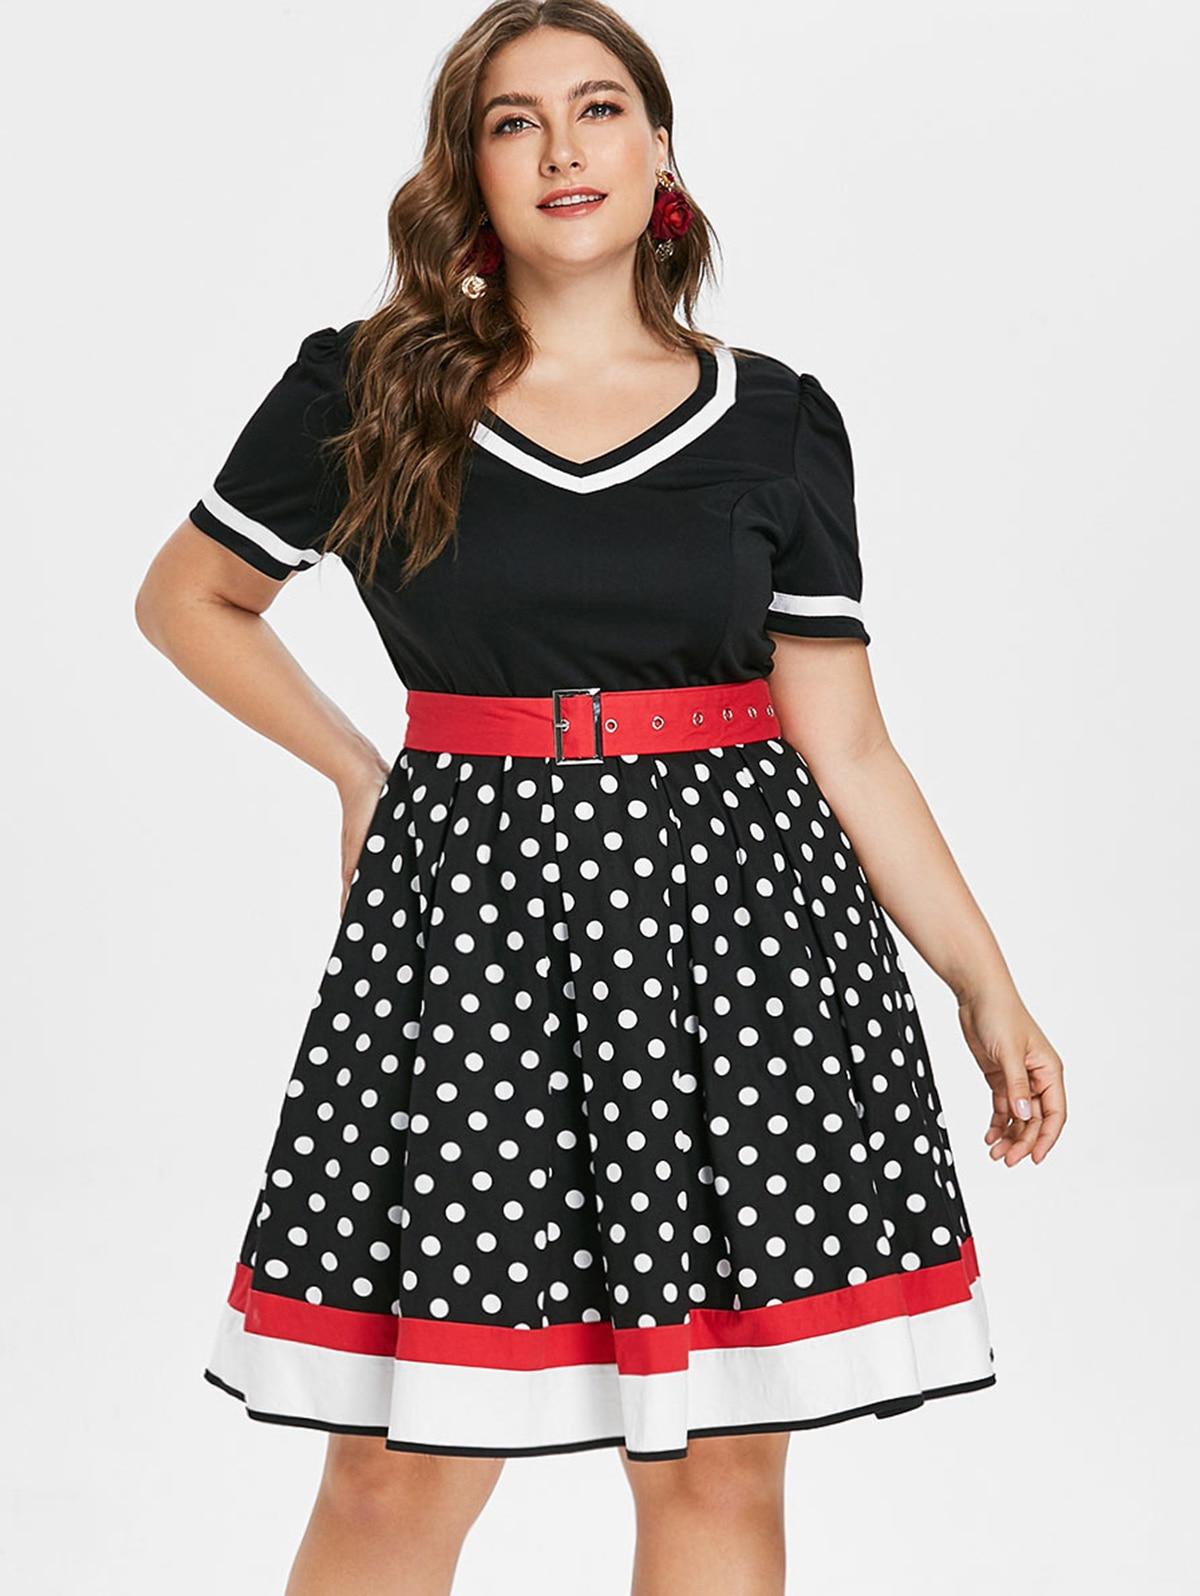 b24516f3969 Wipalo Plus Size Polka Dot Vintage Dress Women Color Block Cotton Belt  Summer Dress Retro 50s